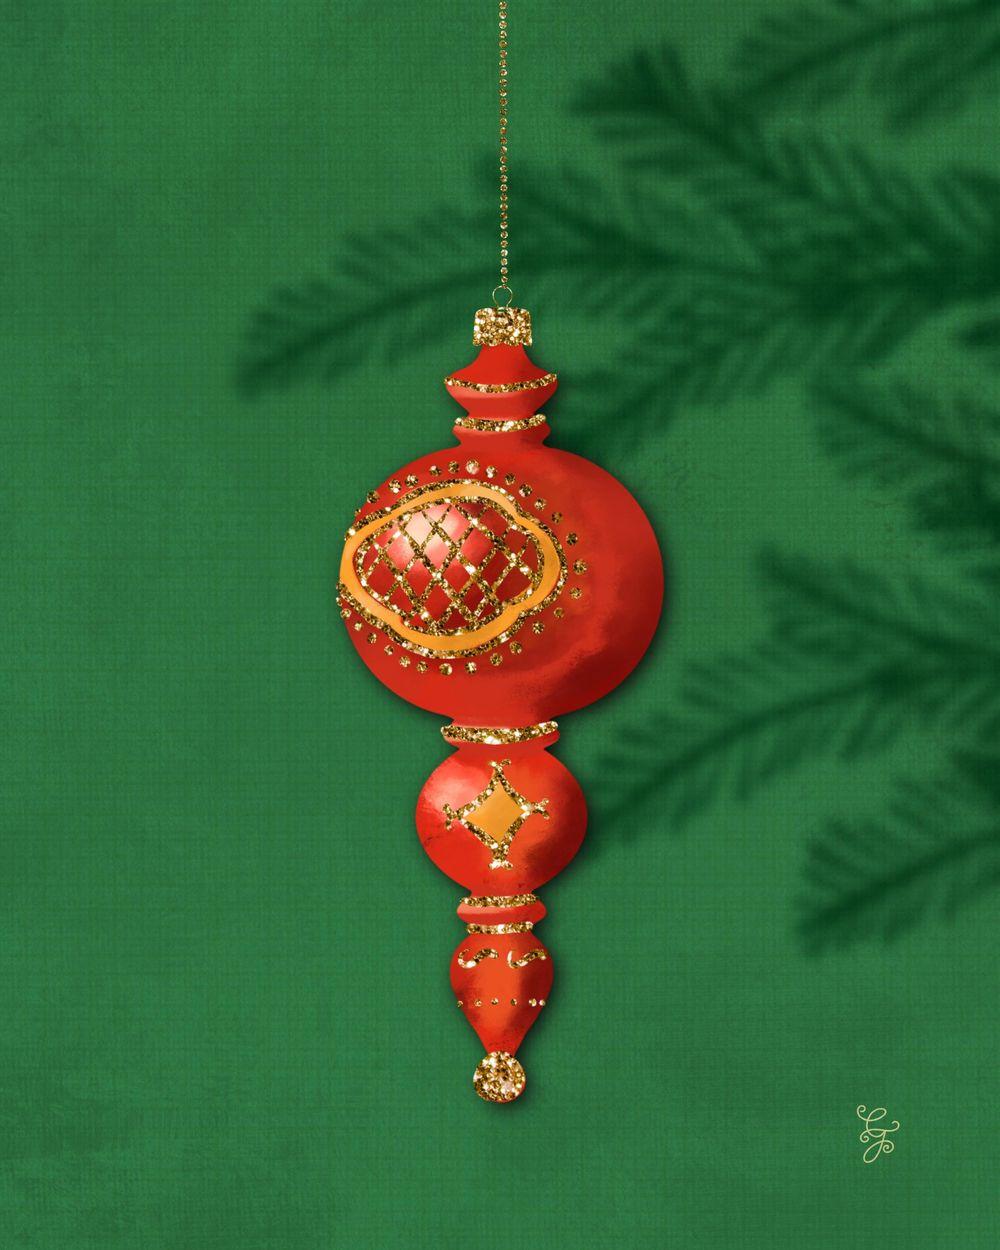 Ornaments went #ipadvintageornaments - image 5 - student project